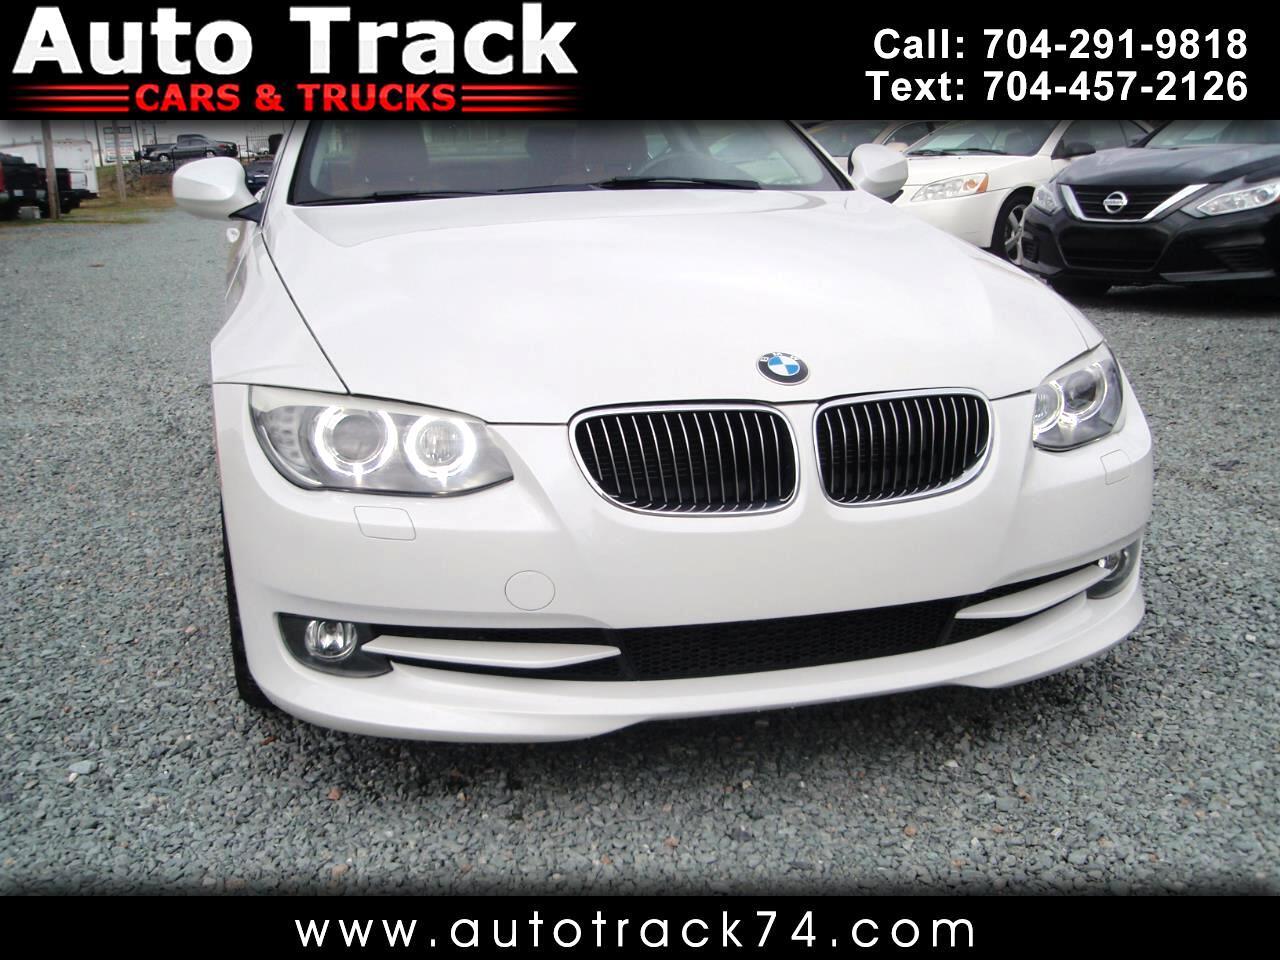 2013 BMW 3 Series 2dr Cpe 335i RWD